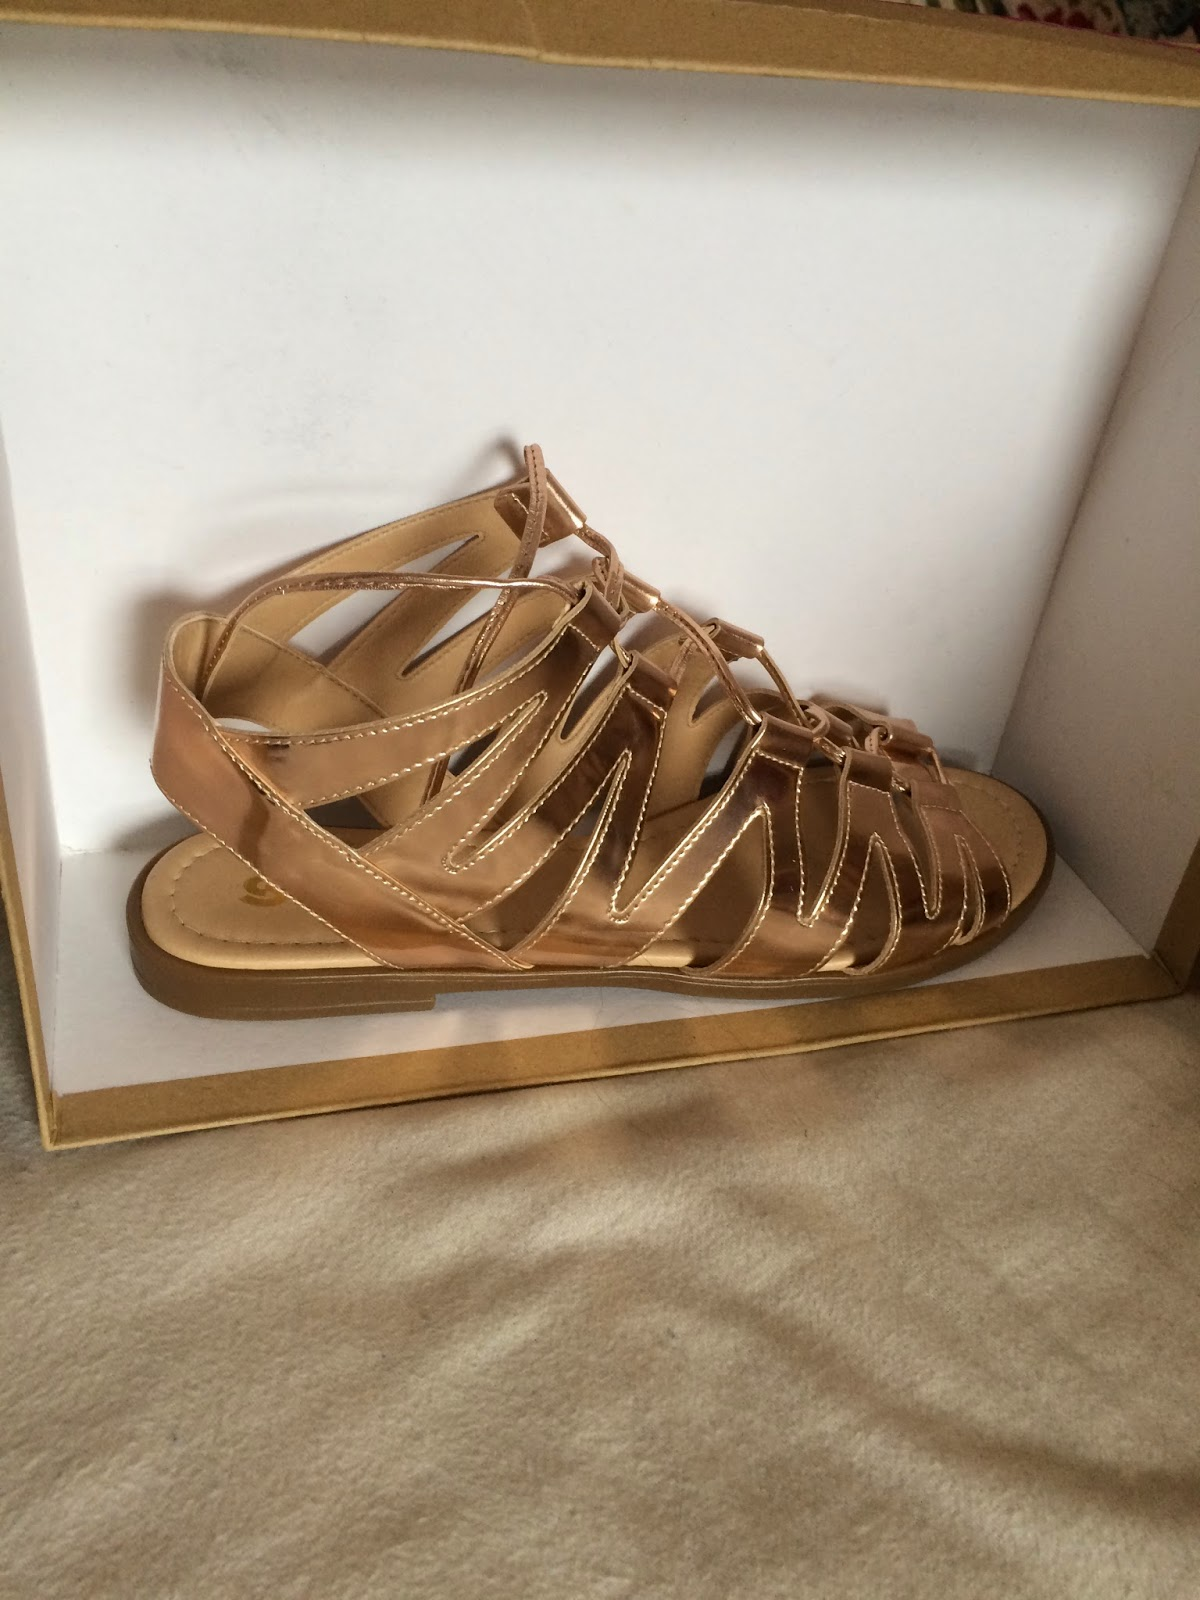 Schuh Gladiator Sandals Bronze